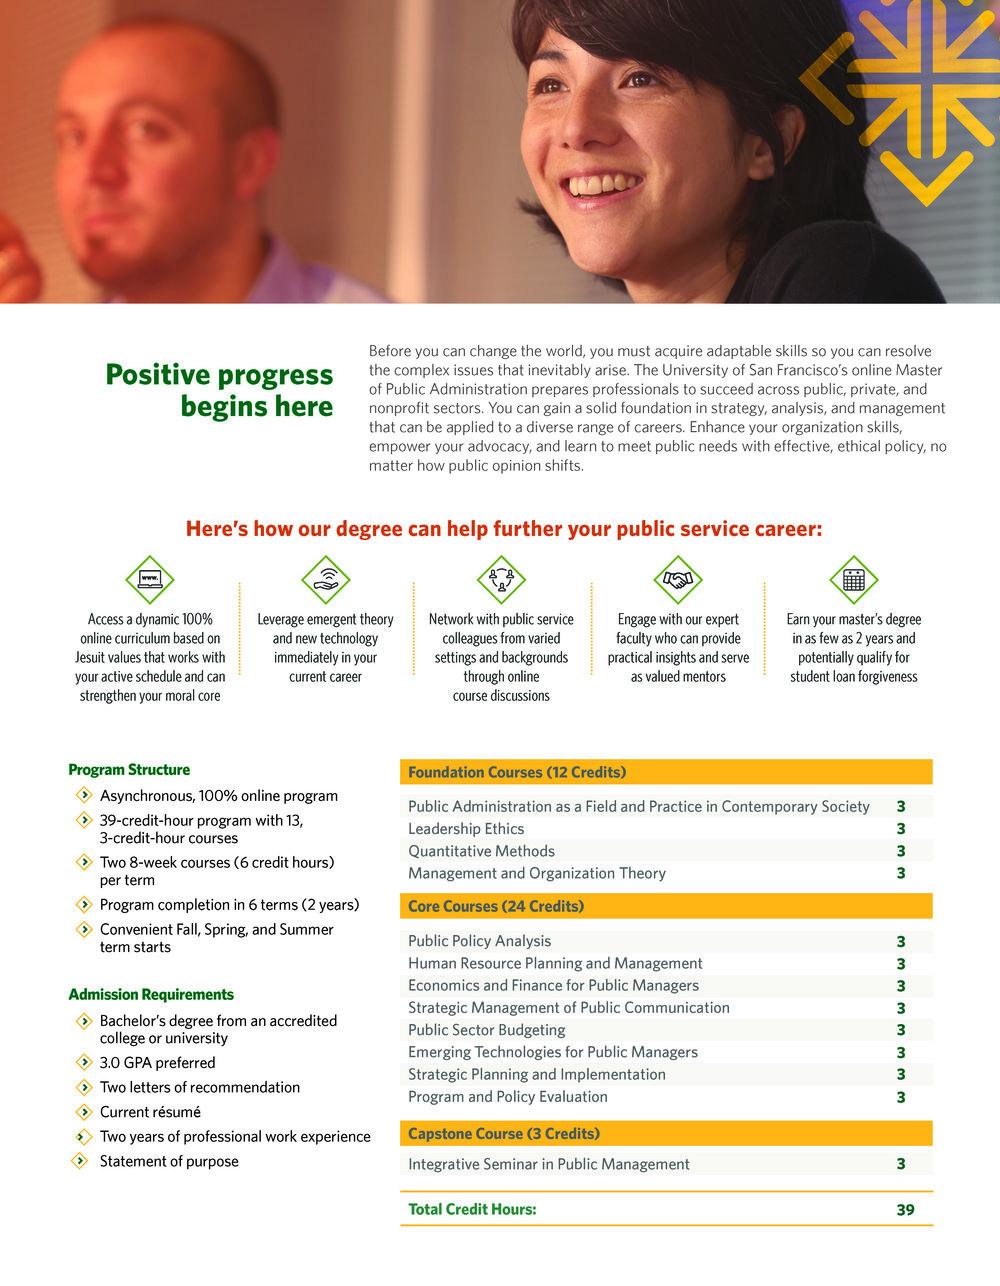 USFMPA Brochure20160324_901p_Page_2.jpg